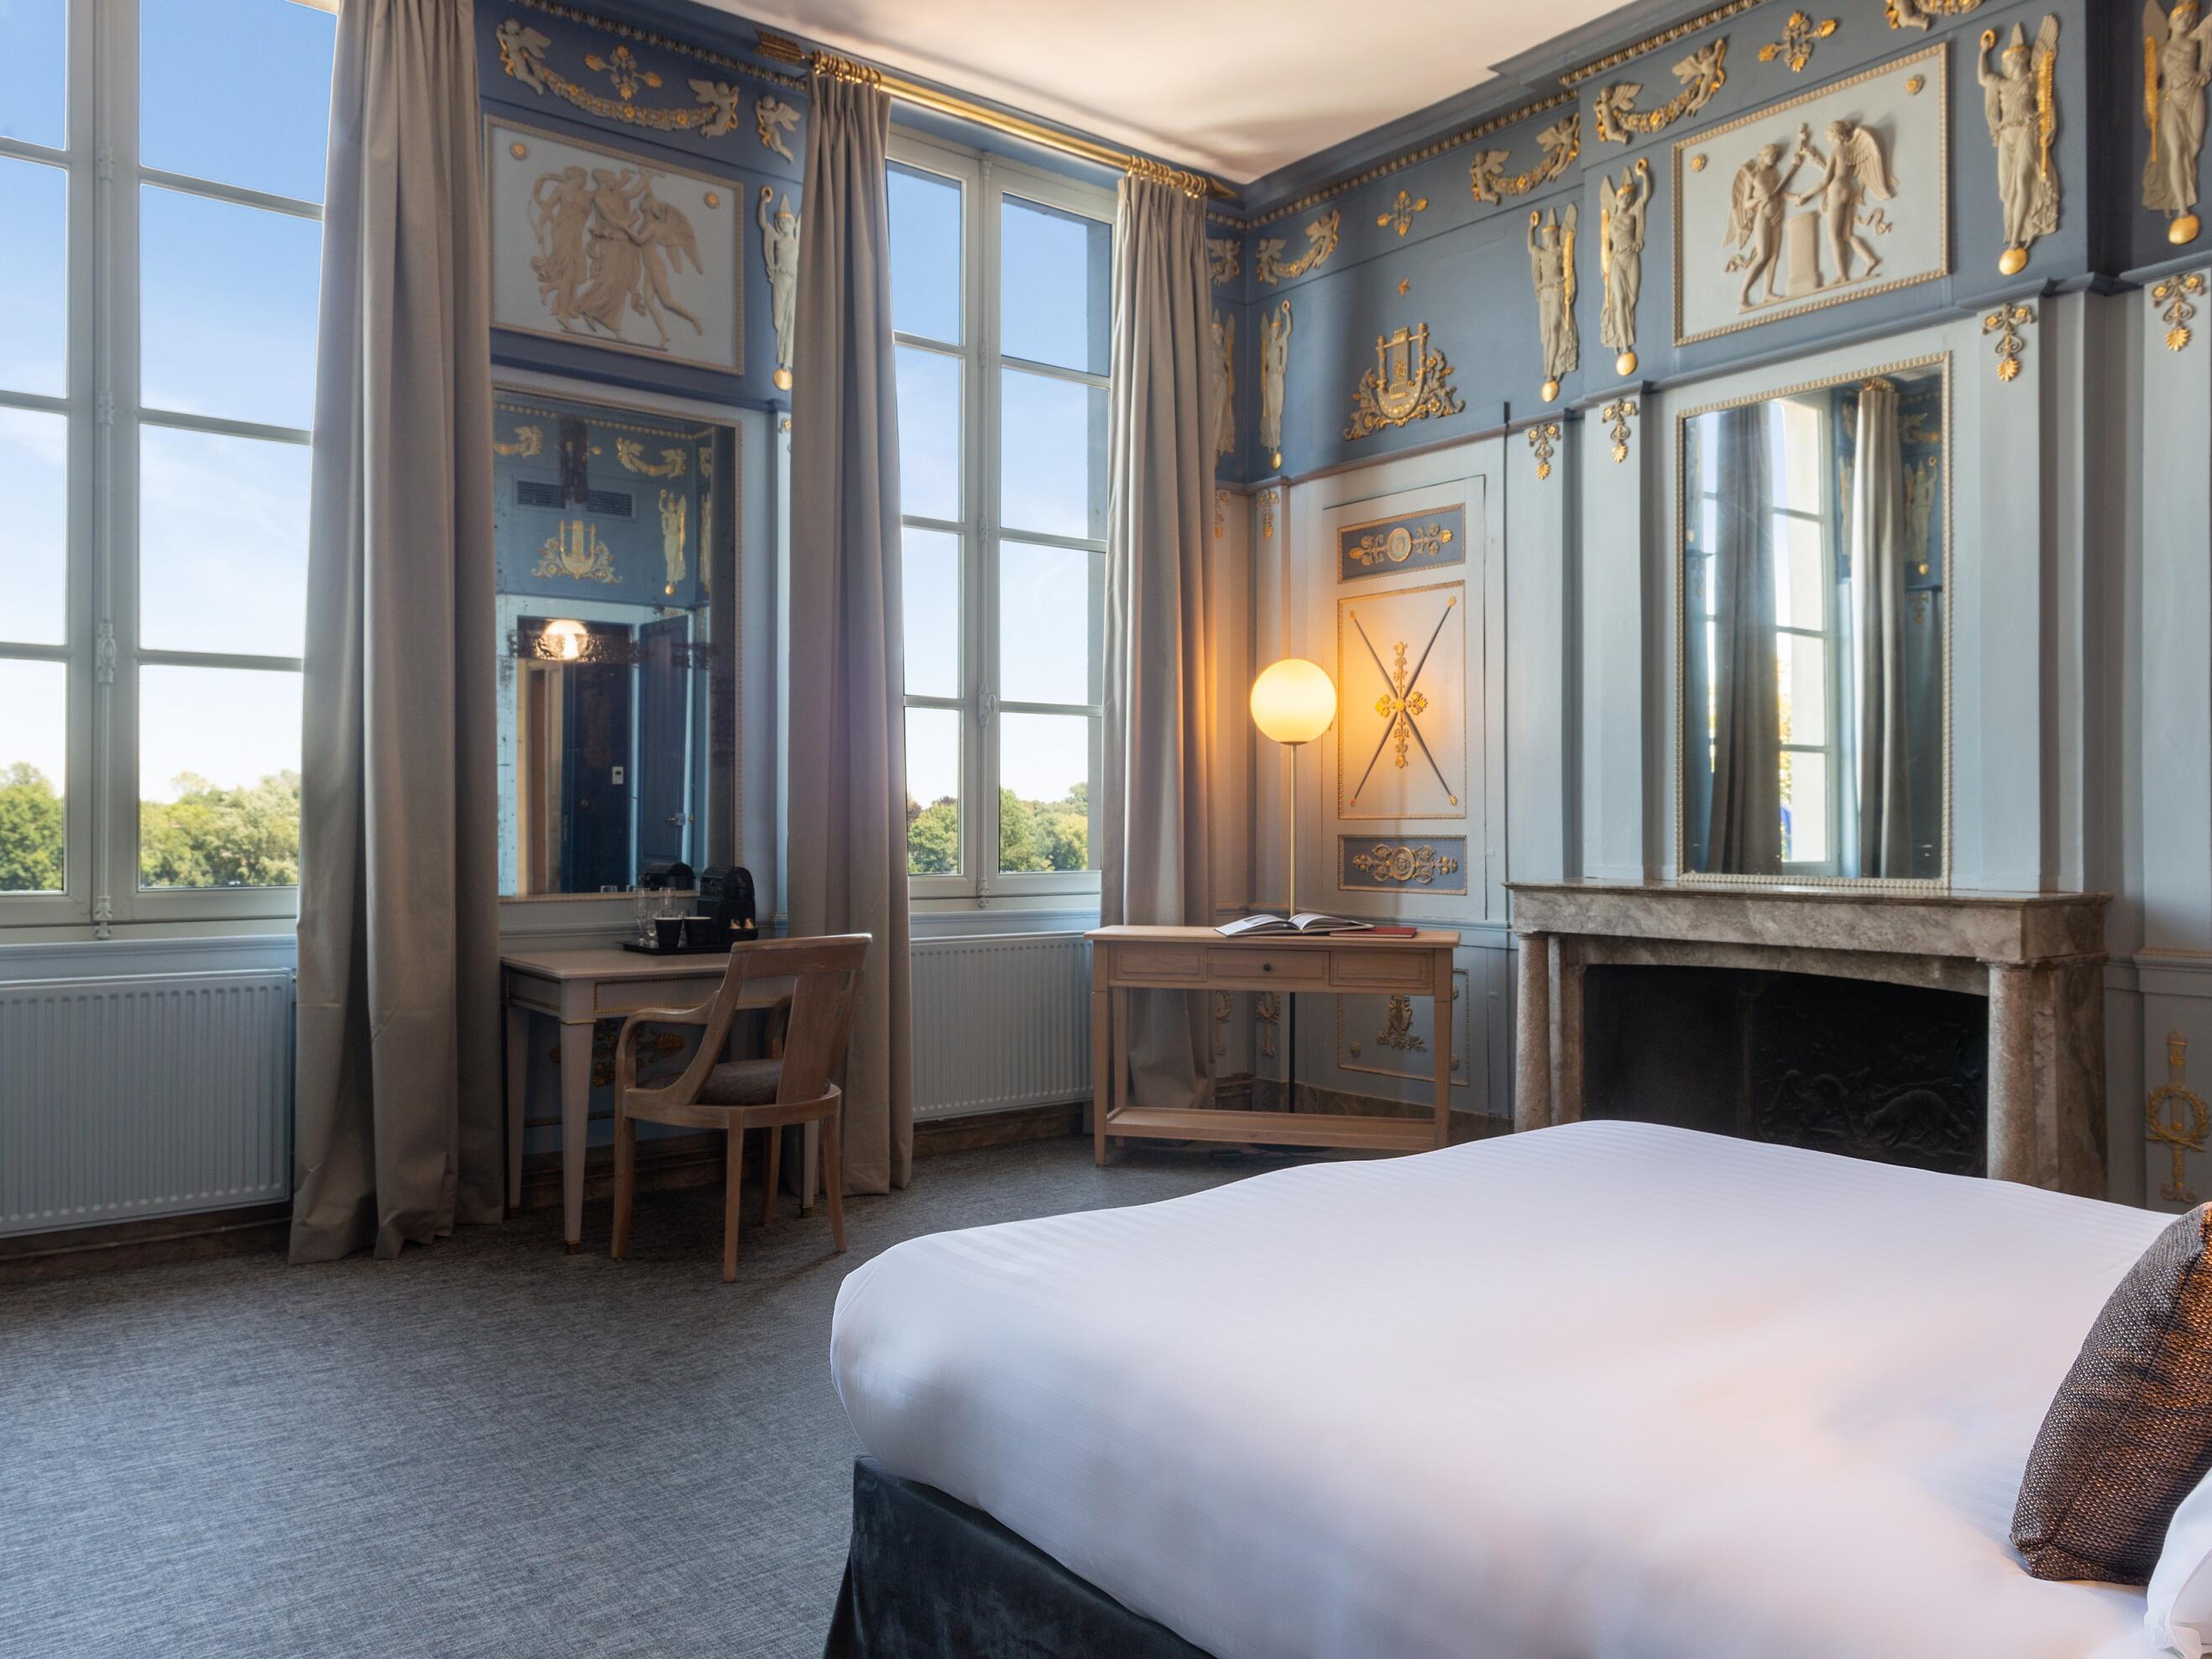 Interior of chambre prestige loire room at The Originals Hotels